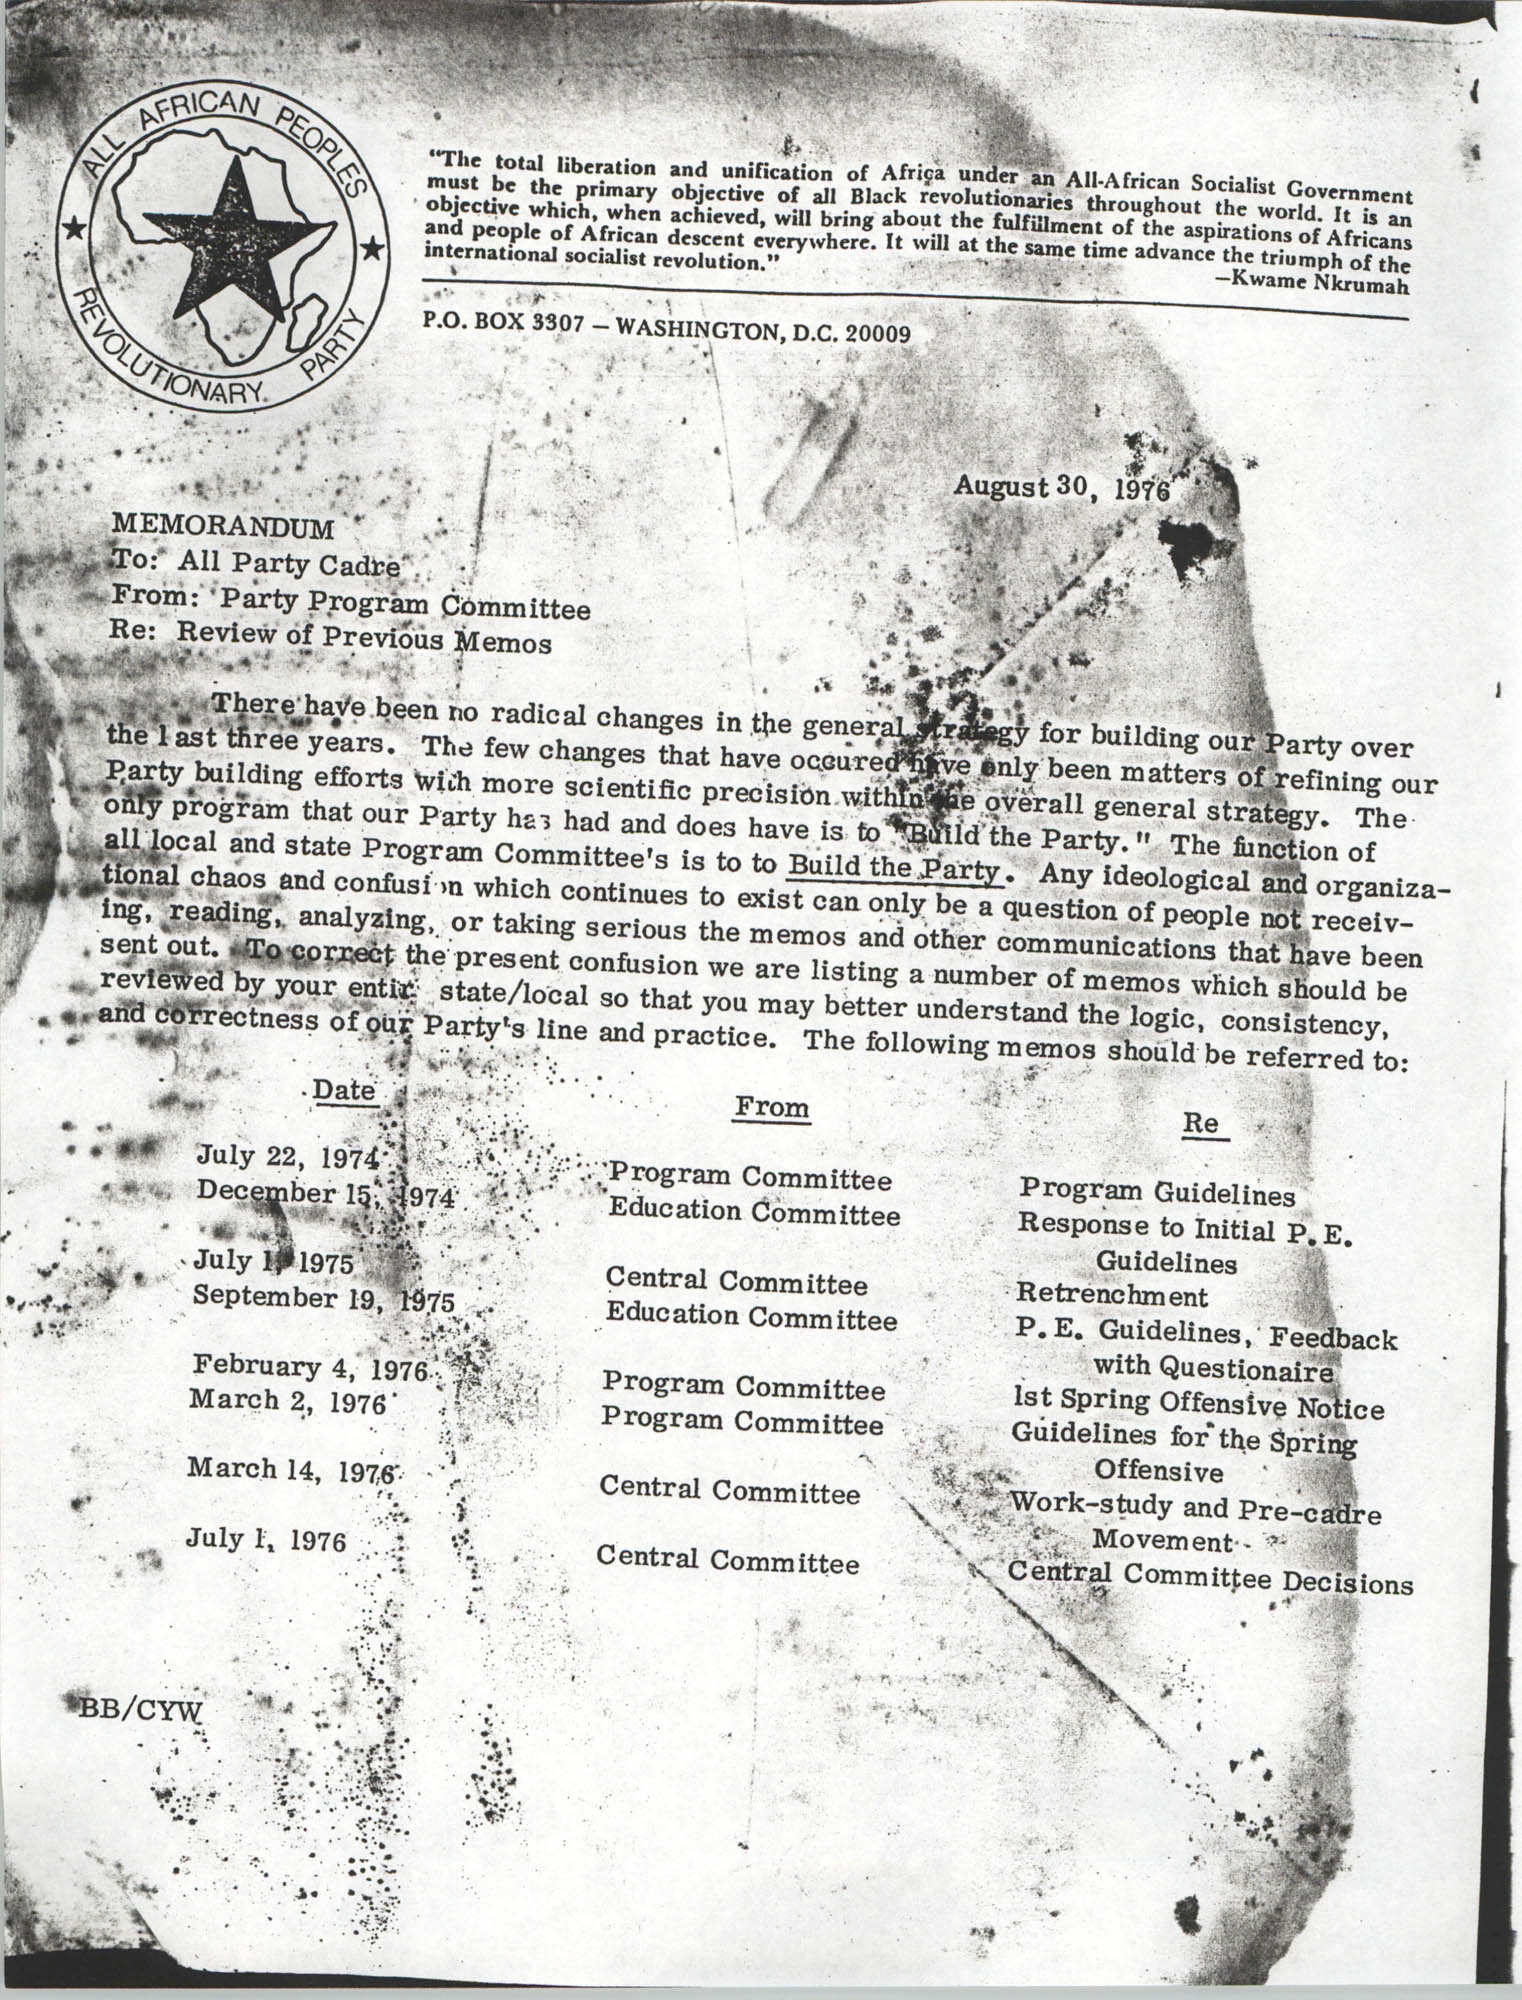 All African People's Revolutionary Party Memorandum, August 30, 1976